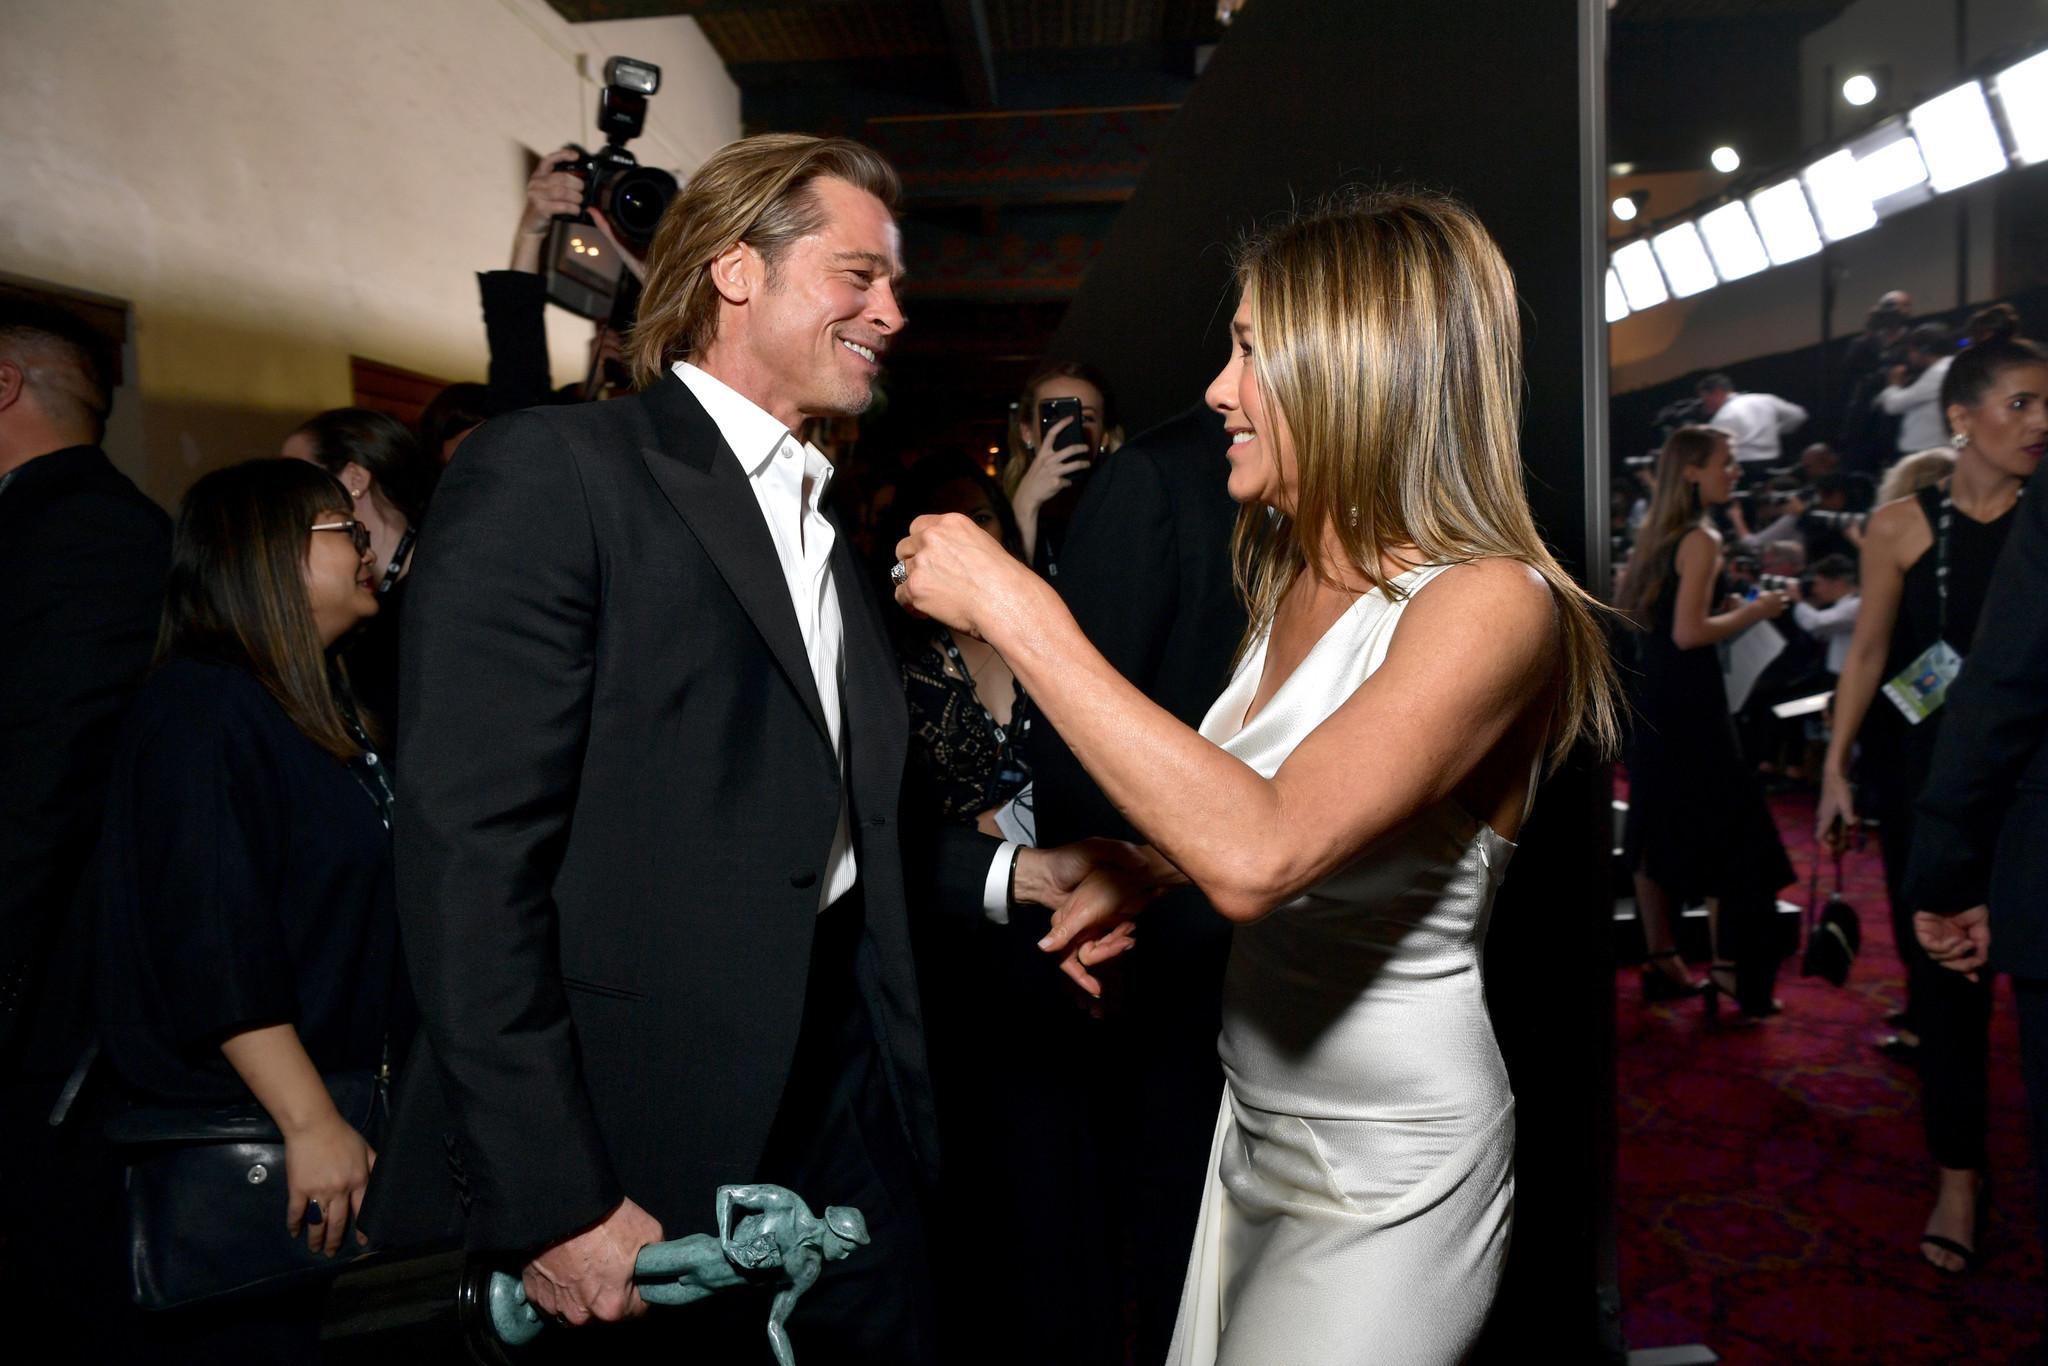 Brad Pitt and Jennifer Aniston reunite after SAG award wins — and everyone swoons